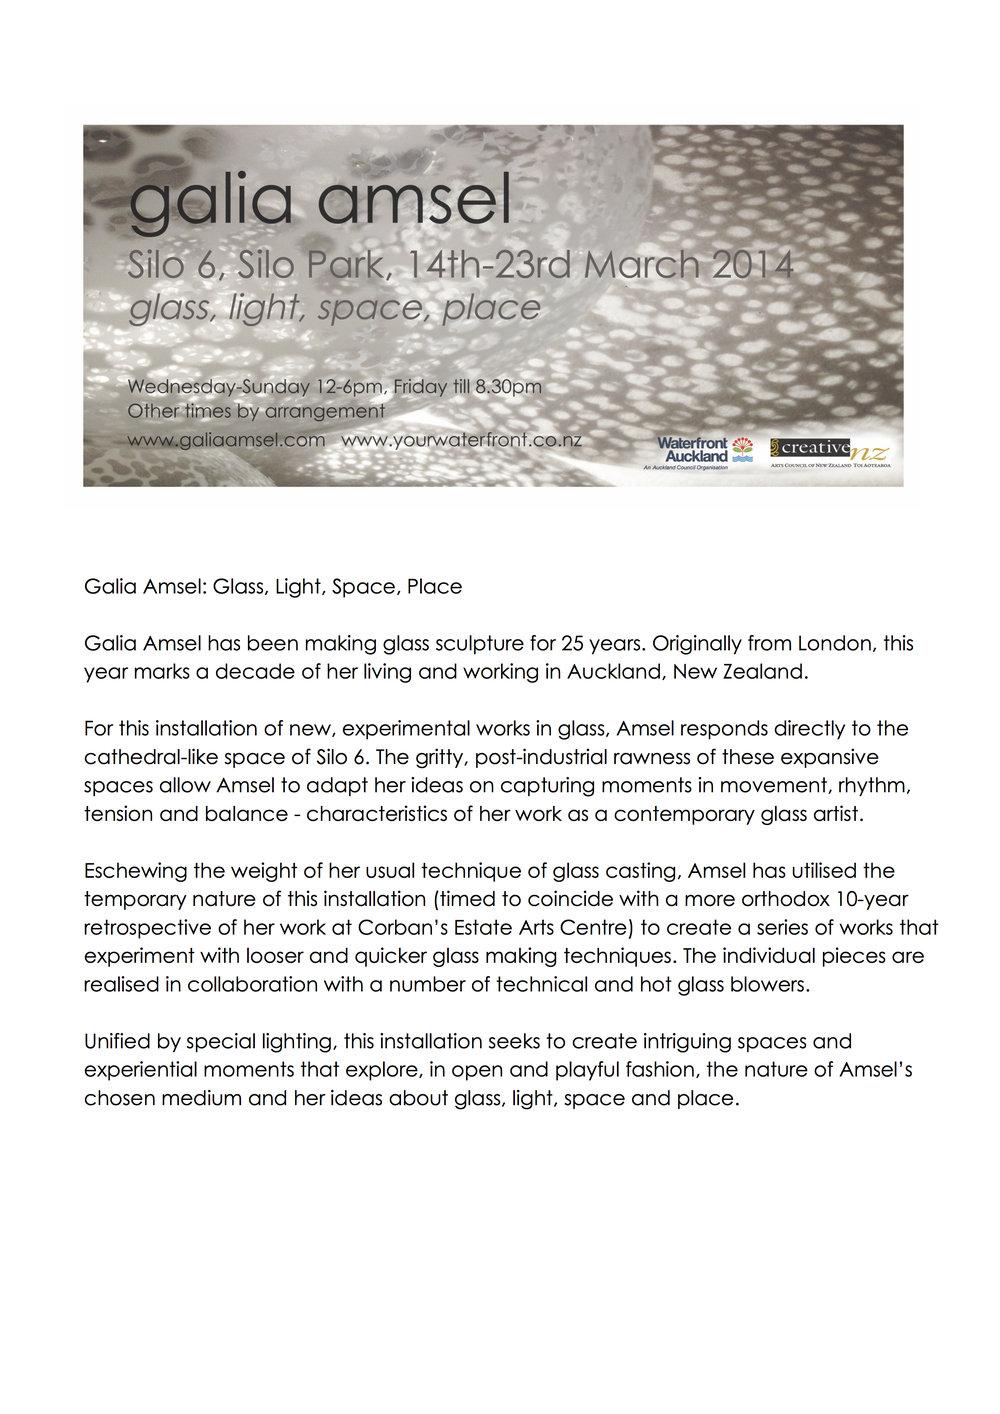 Galia Amsel - Silo info.jpg